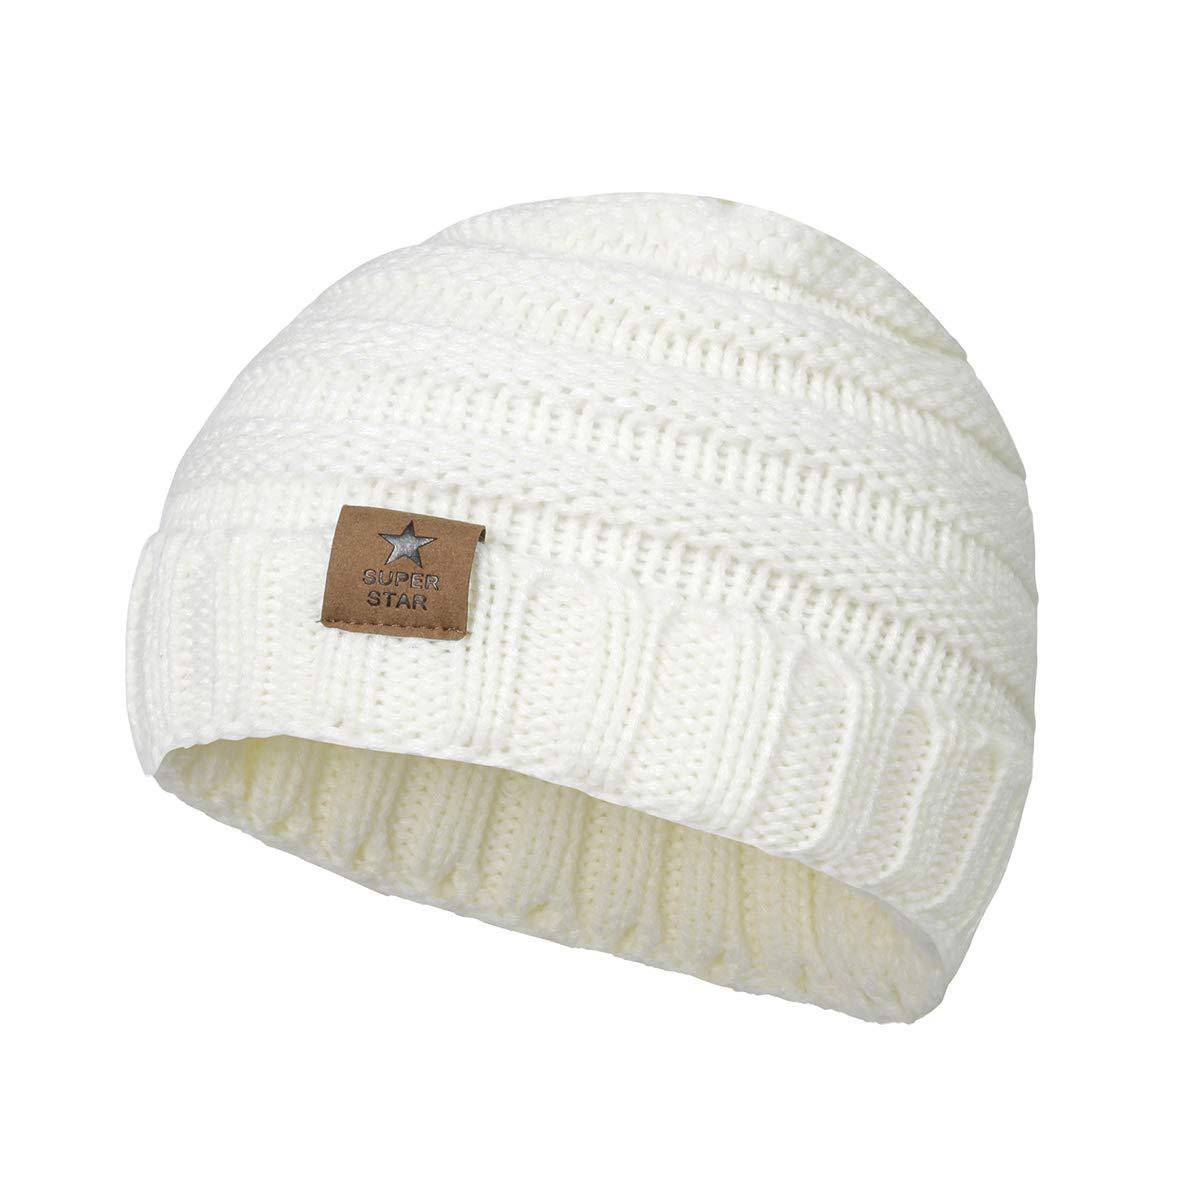 0e5abe2875c Zando Baby Winter Hats Kids Cable Knit Caps Cozy Warm Cute Infant ...